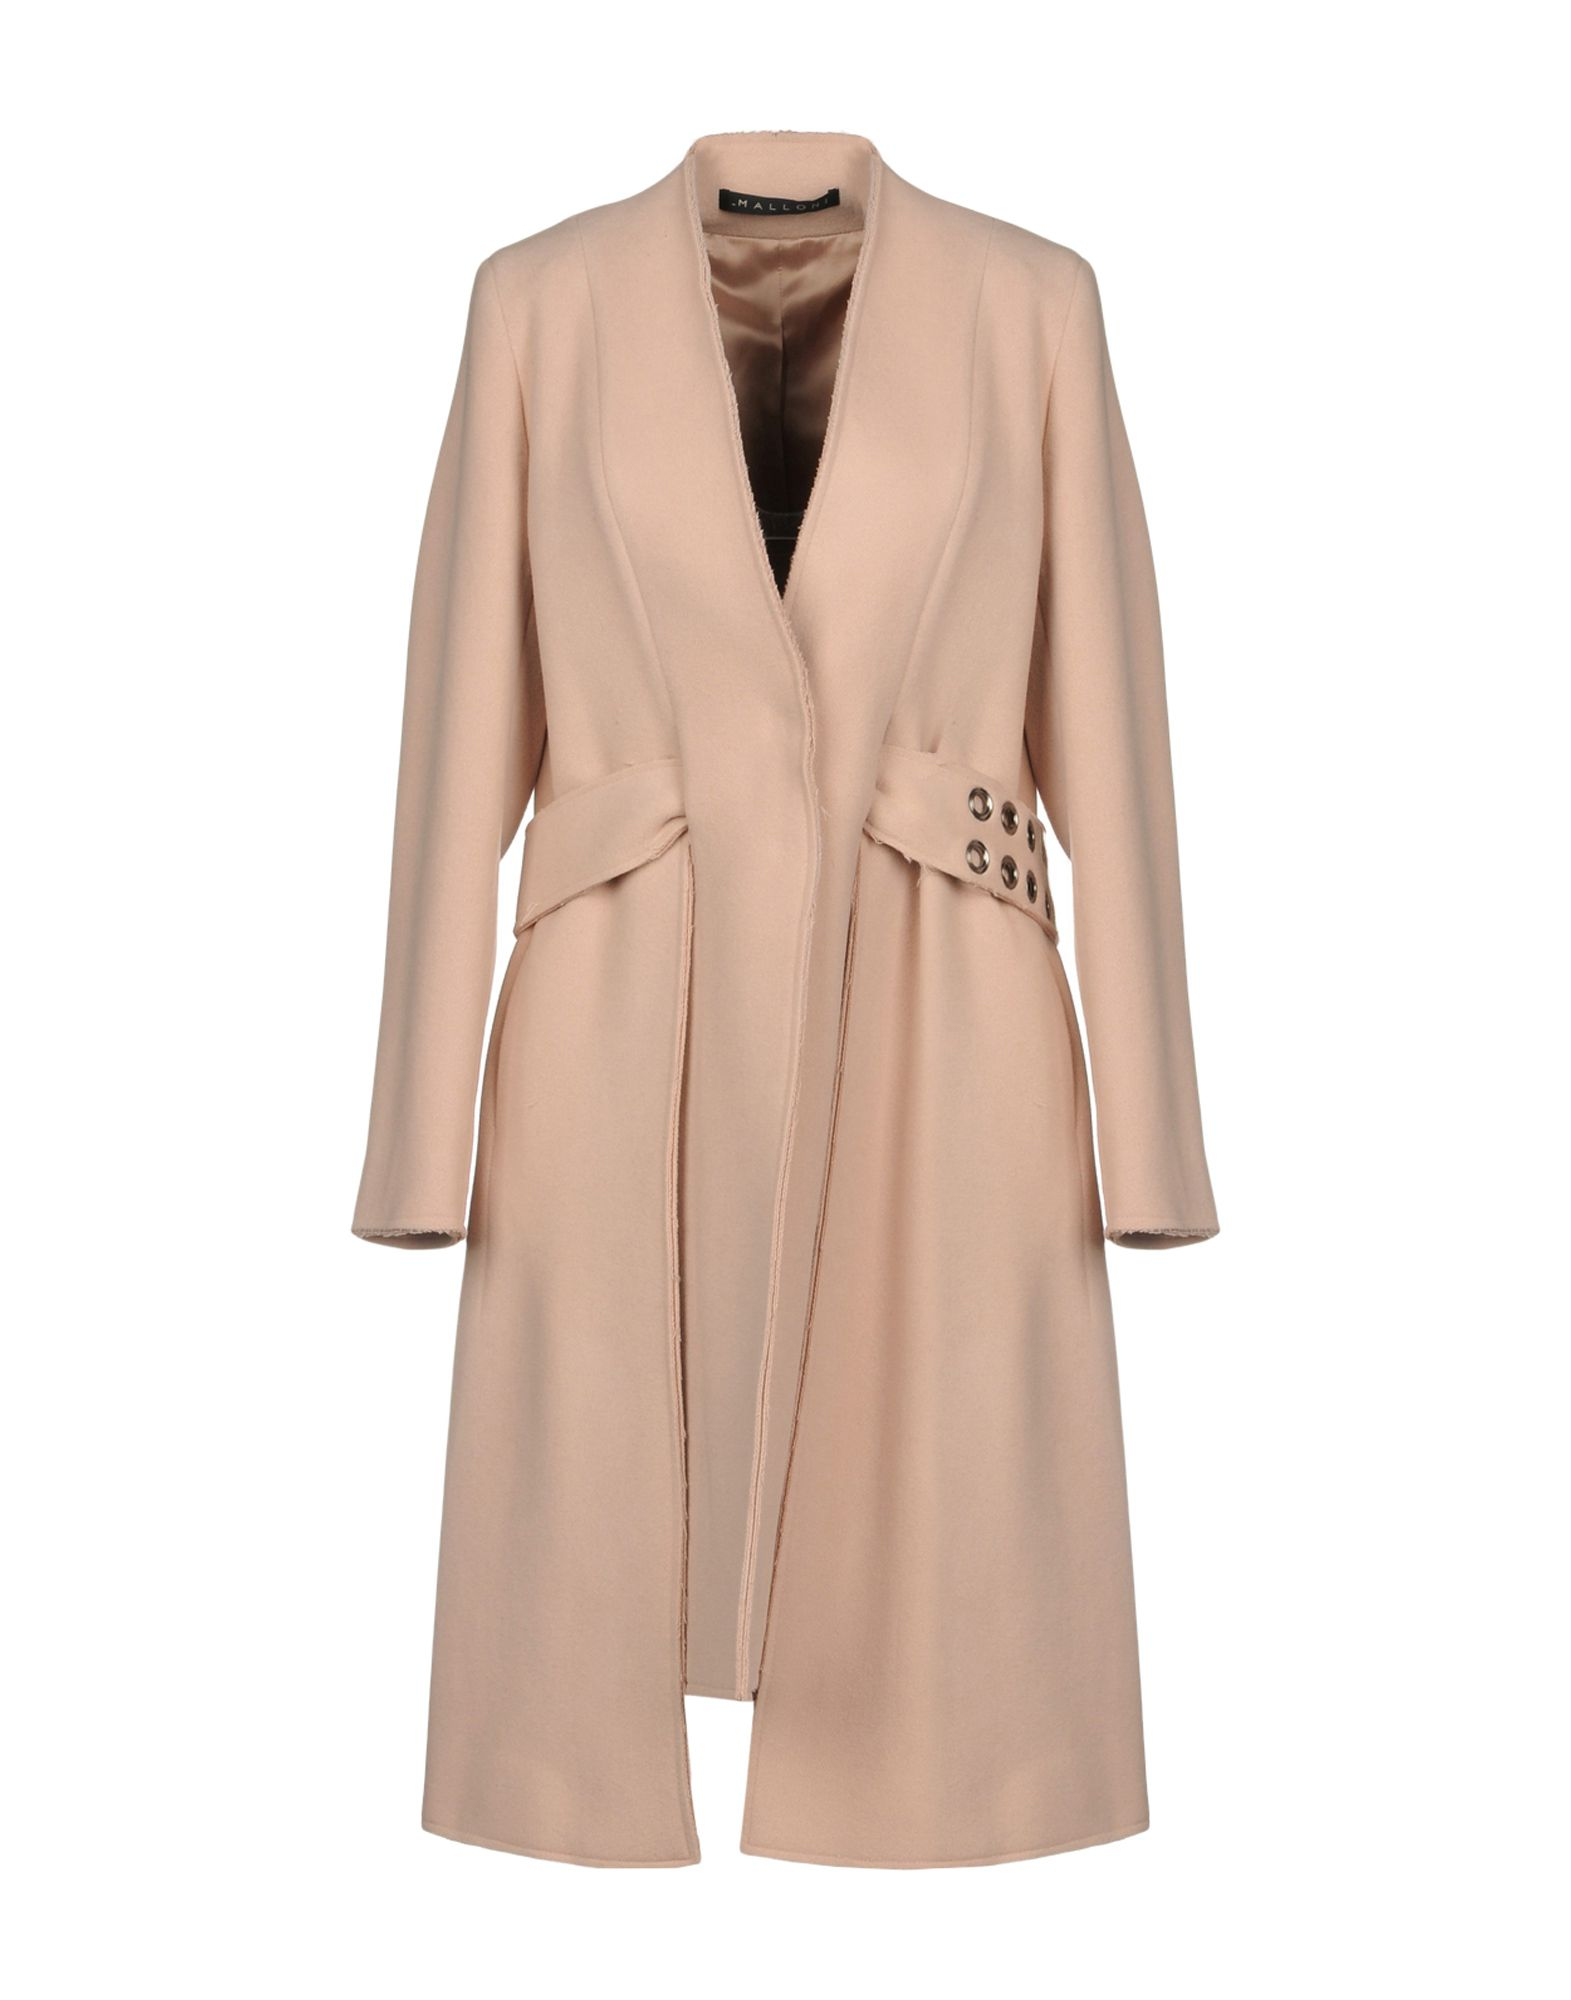 MALLONI Coat in Light Pink